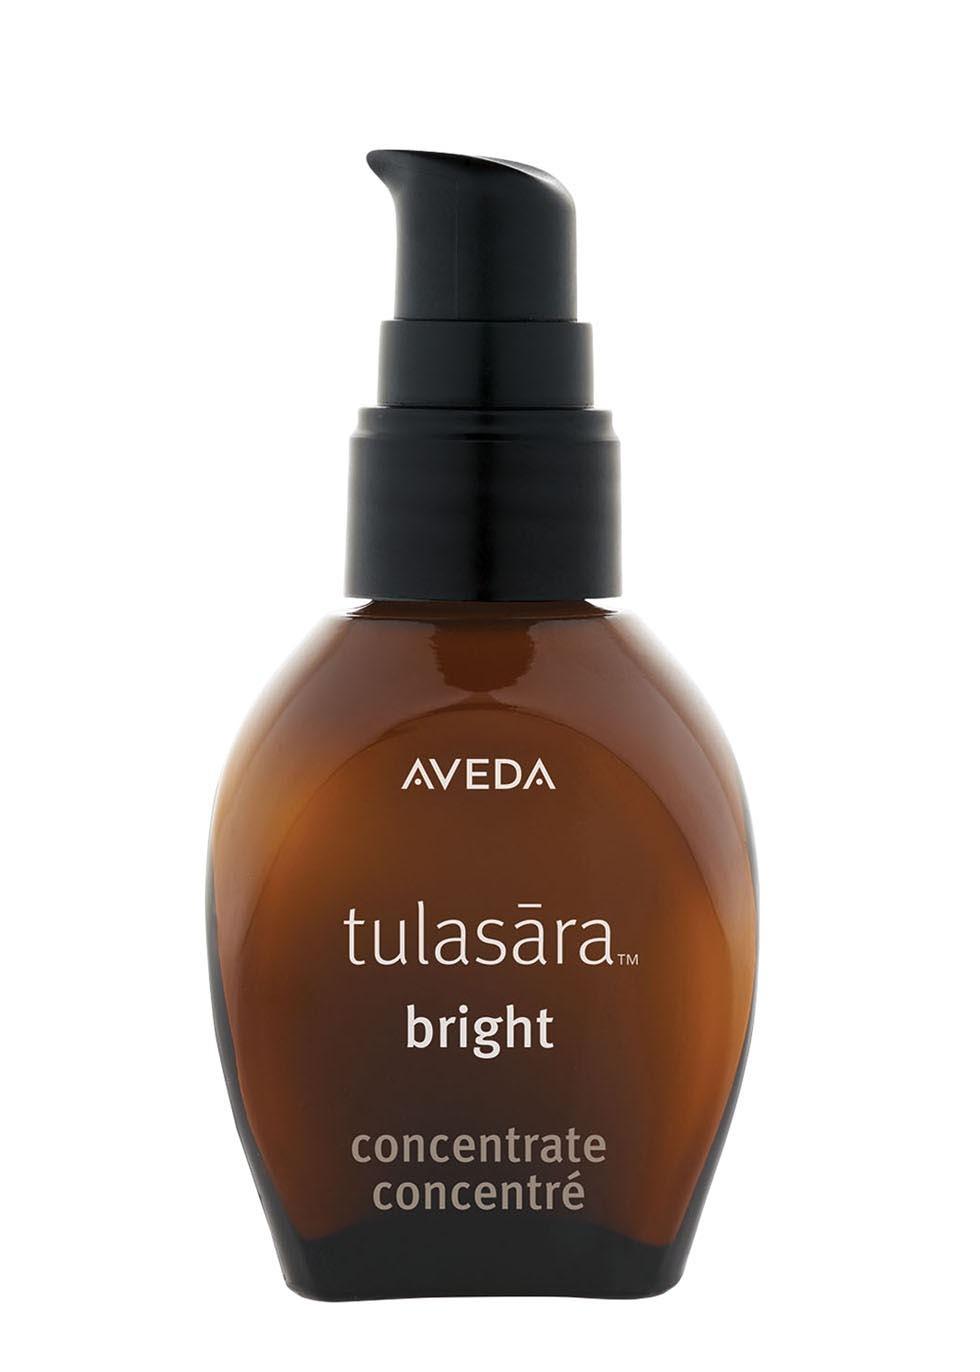 Tulasara™ Bright Concentrate 30ml